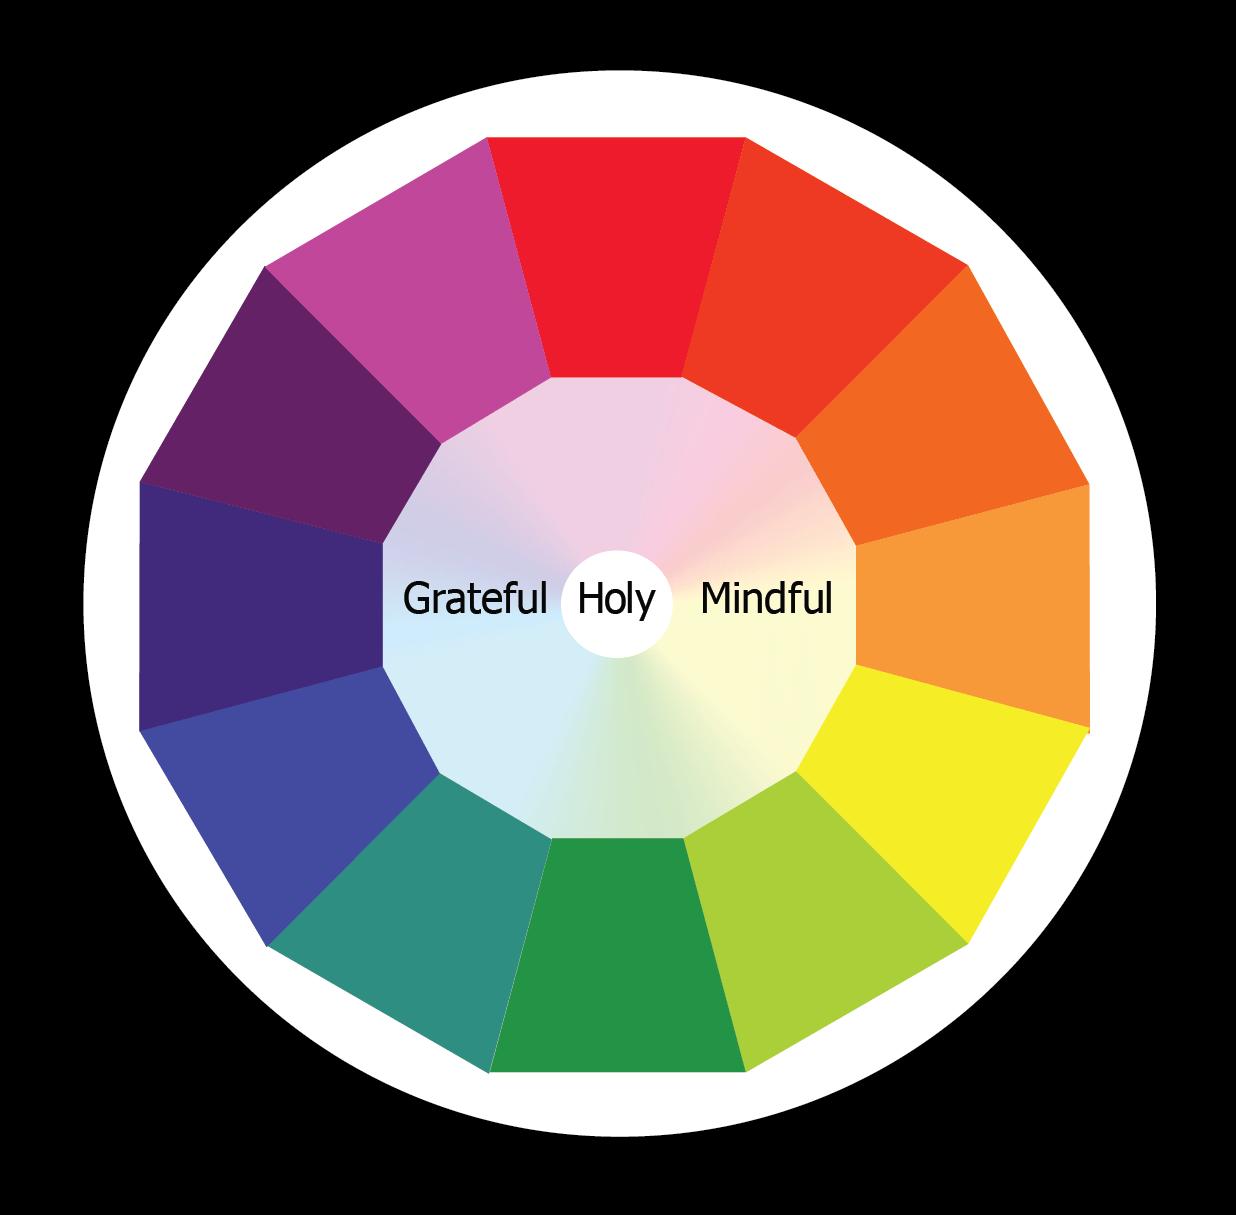 Graphic on three virtues